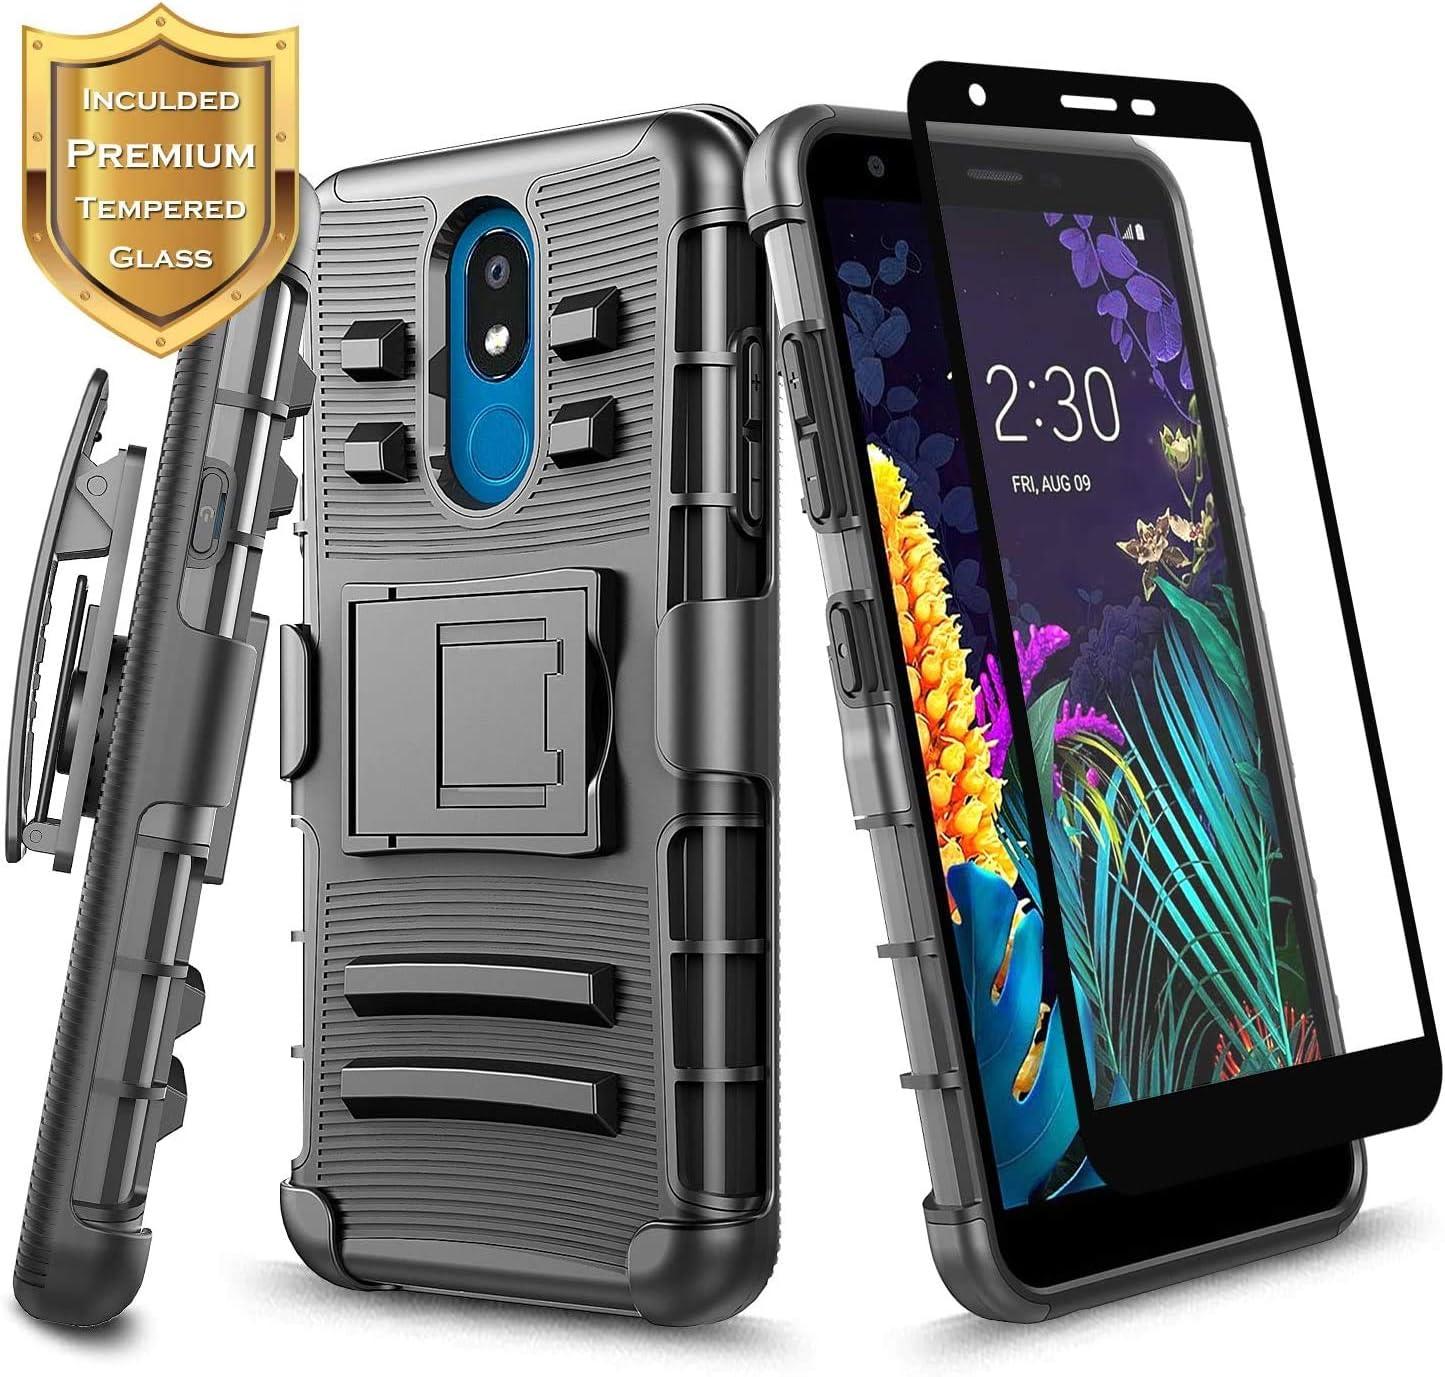 E-Began Case for LG Aristo 4+ Plus, Journey LTE/Prime 2/Neon Plus/Escape Plus/Arena 2/Tribute Royal/K30 2019 w/Tempered Glass Screen Protector, Belt Clip Holster Armor Defender Shockproof Case -Black